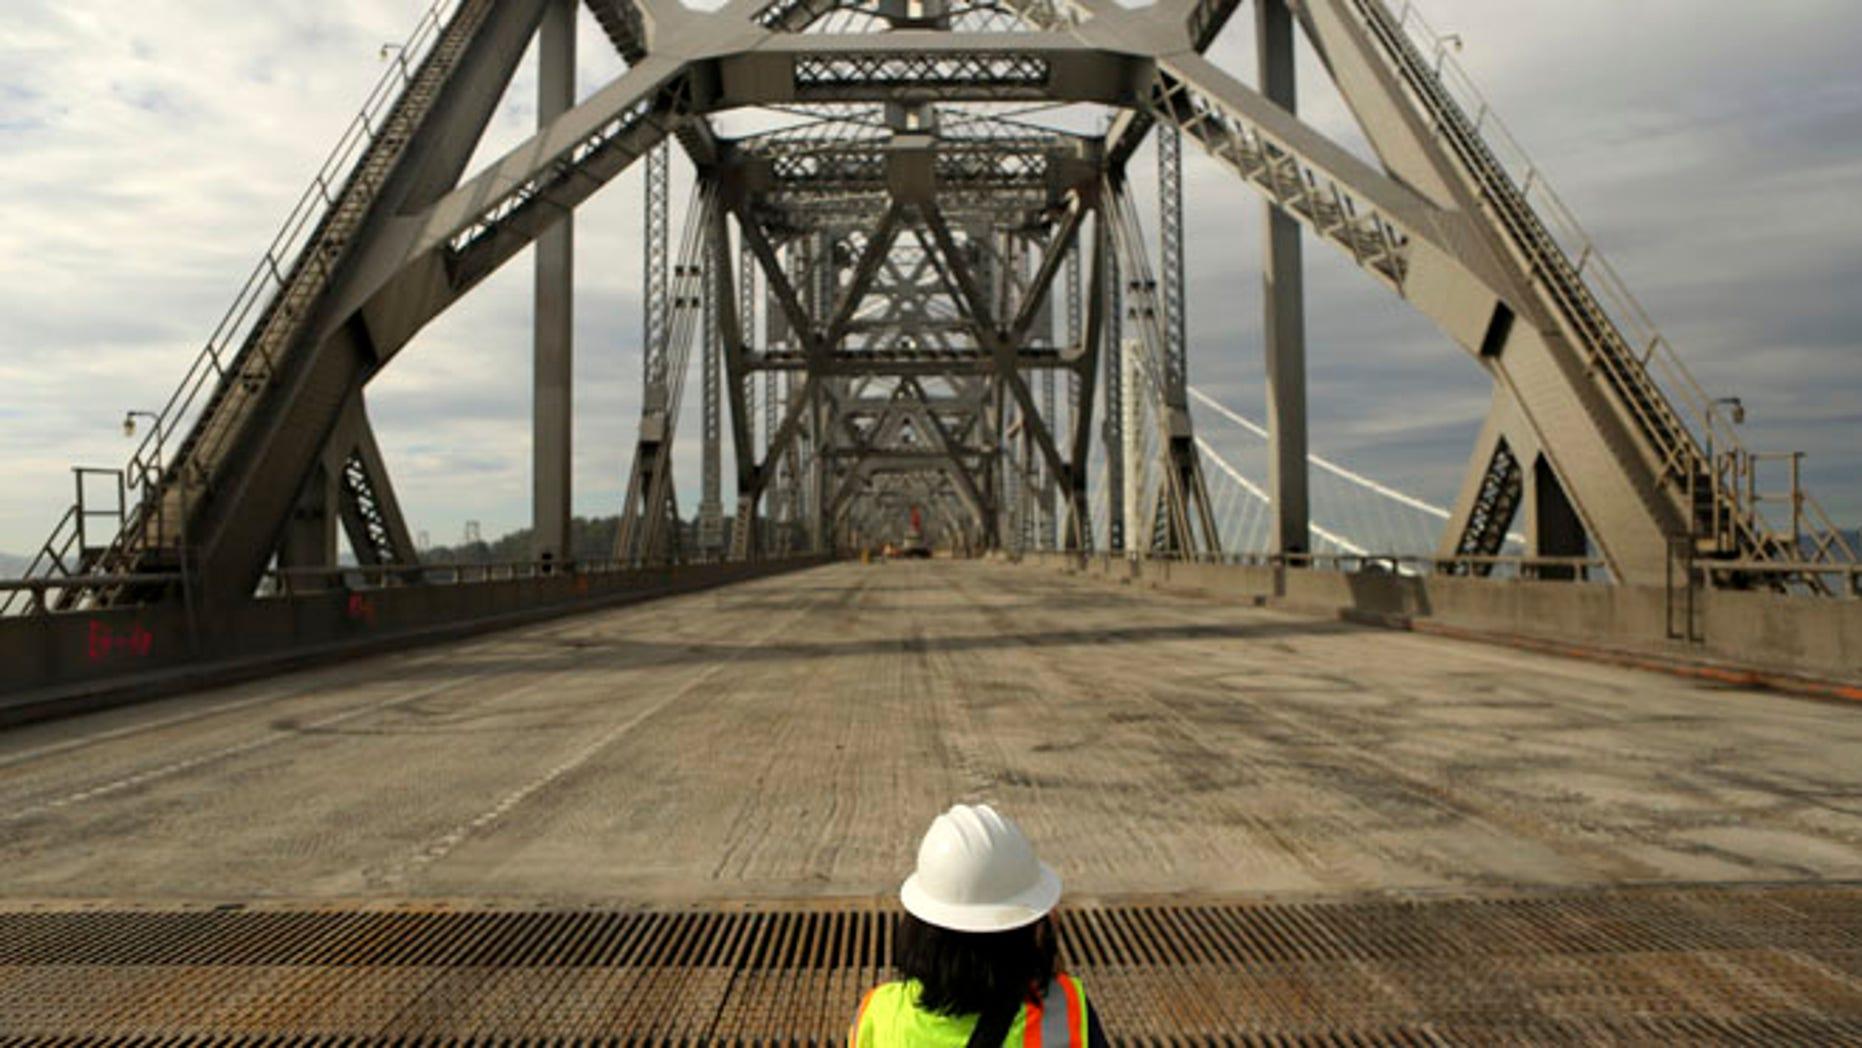 Nov. 12, 2013: A journalist looks over the original east span of the San Francisco Oakland Bay Bridge,